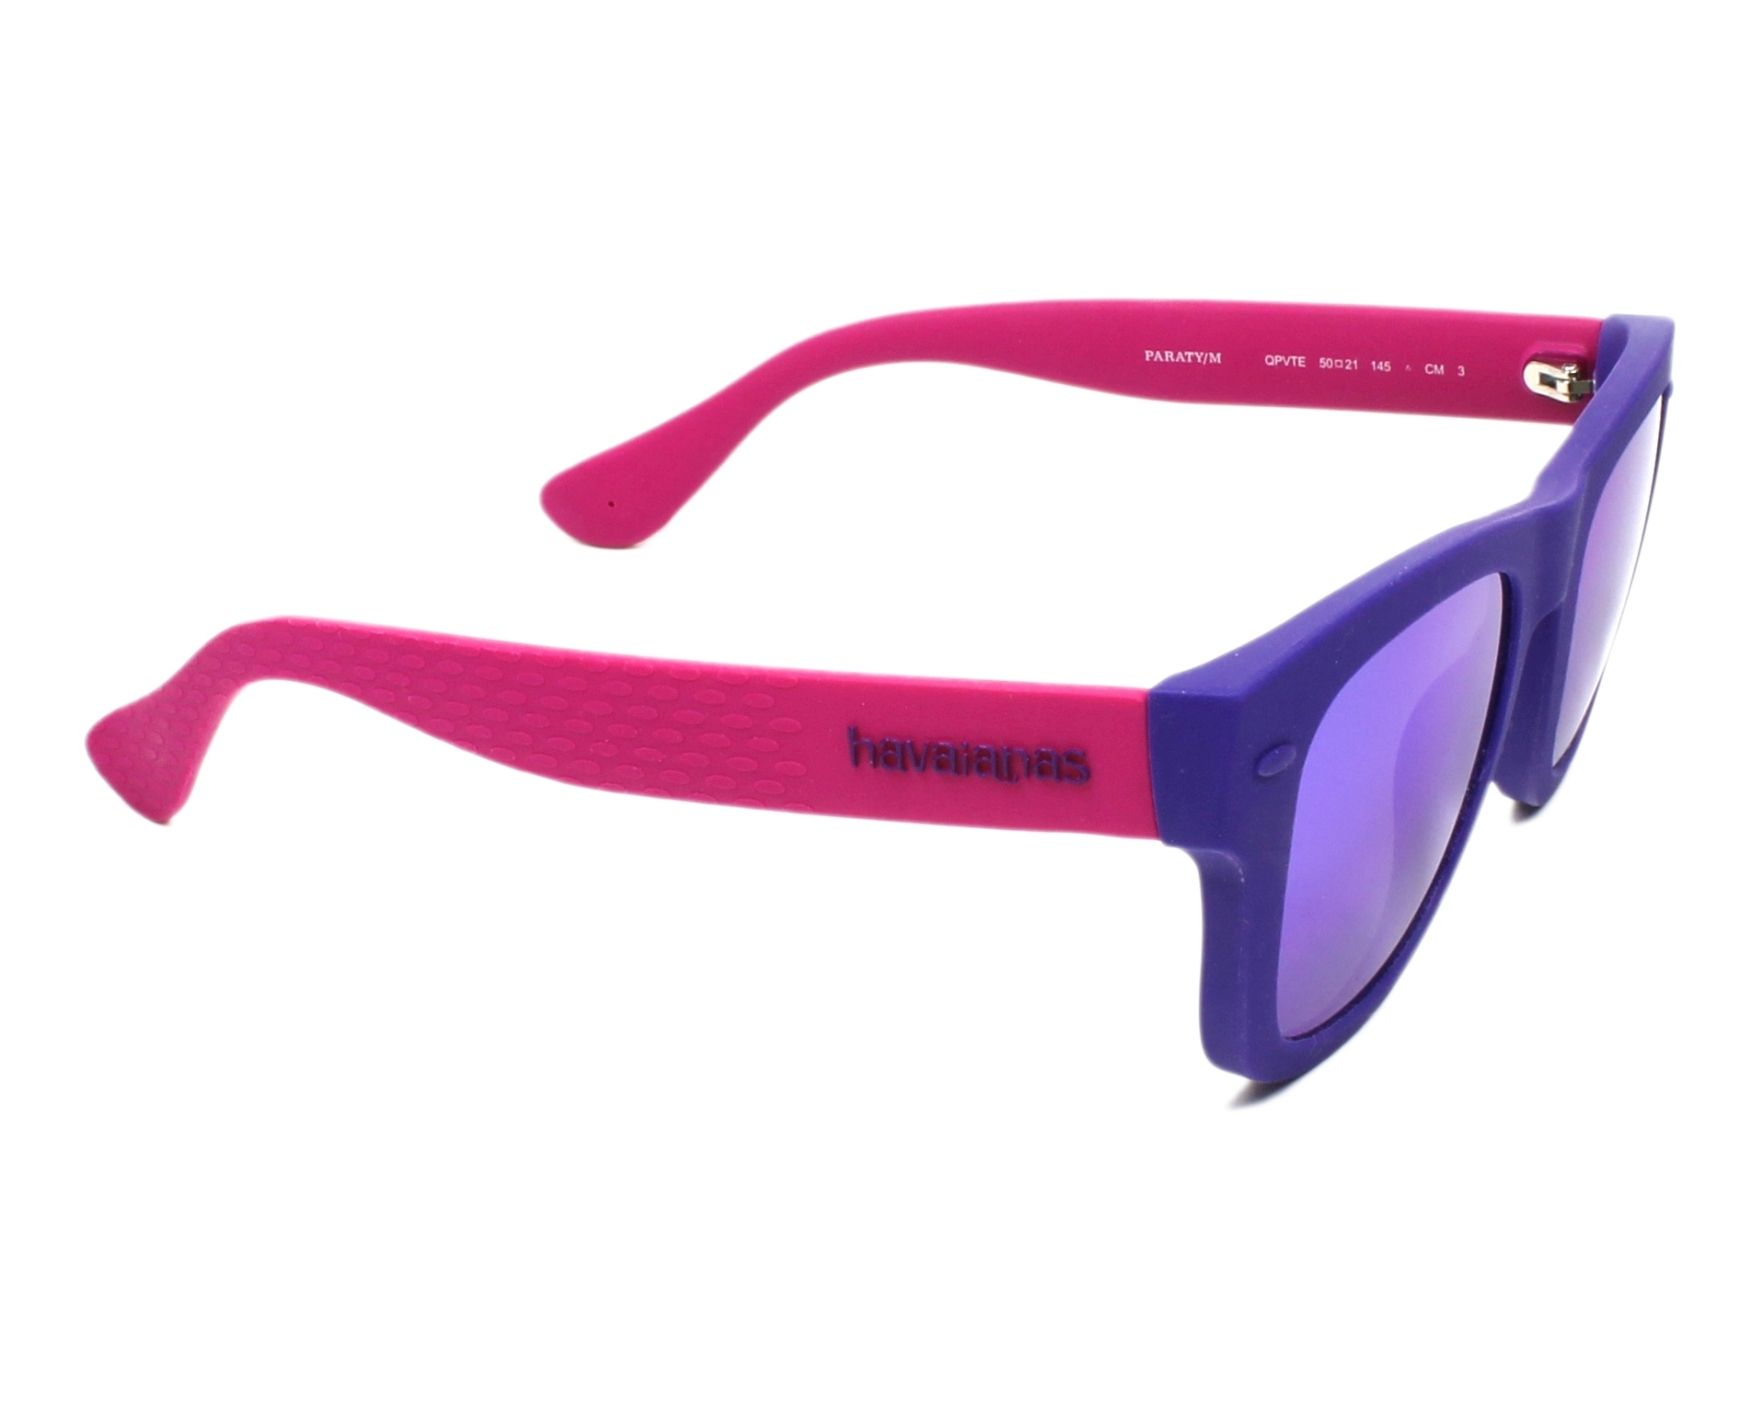 a3e6ff72c6f Sunglasses Havaianas PARATY-M QPV TE 50-21 Purple Fuchsia side view